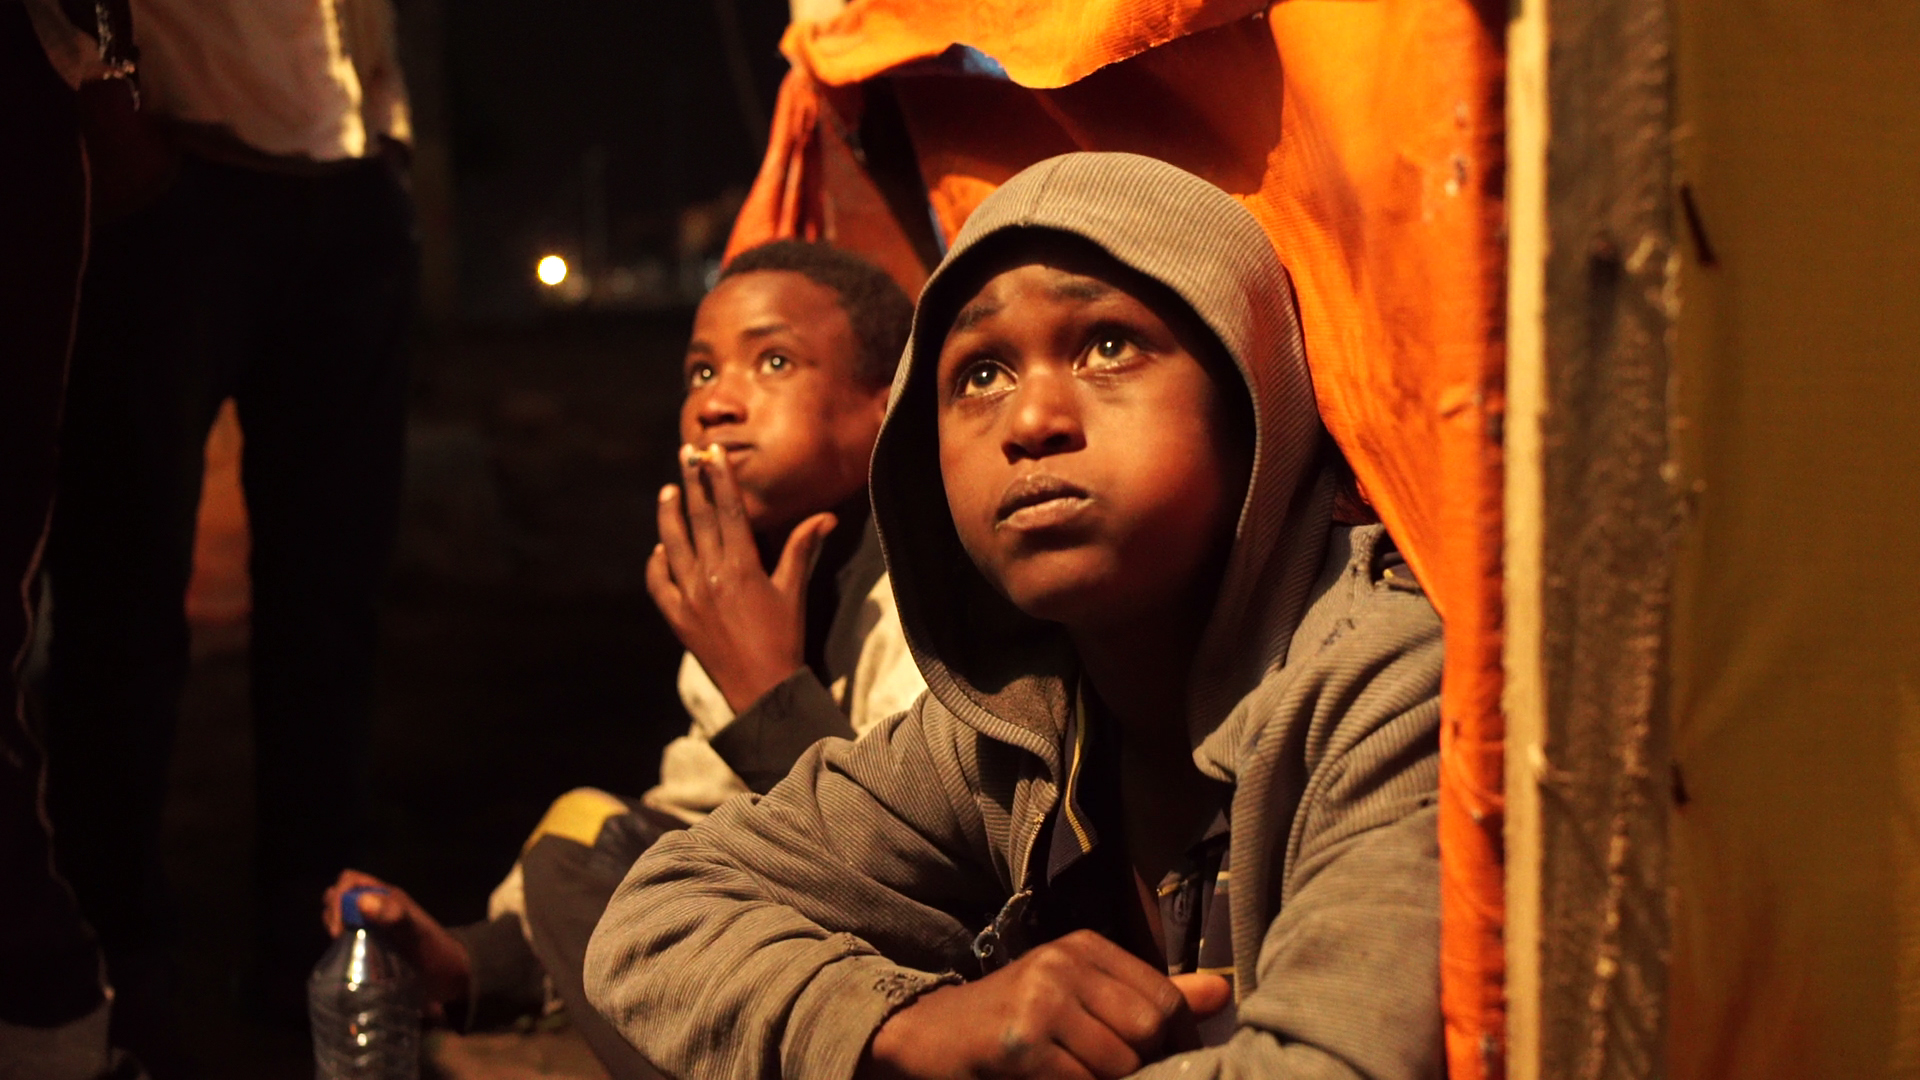 Kadir 13 & Dita 14 - two Street Kids with addiction issues